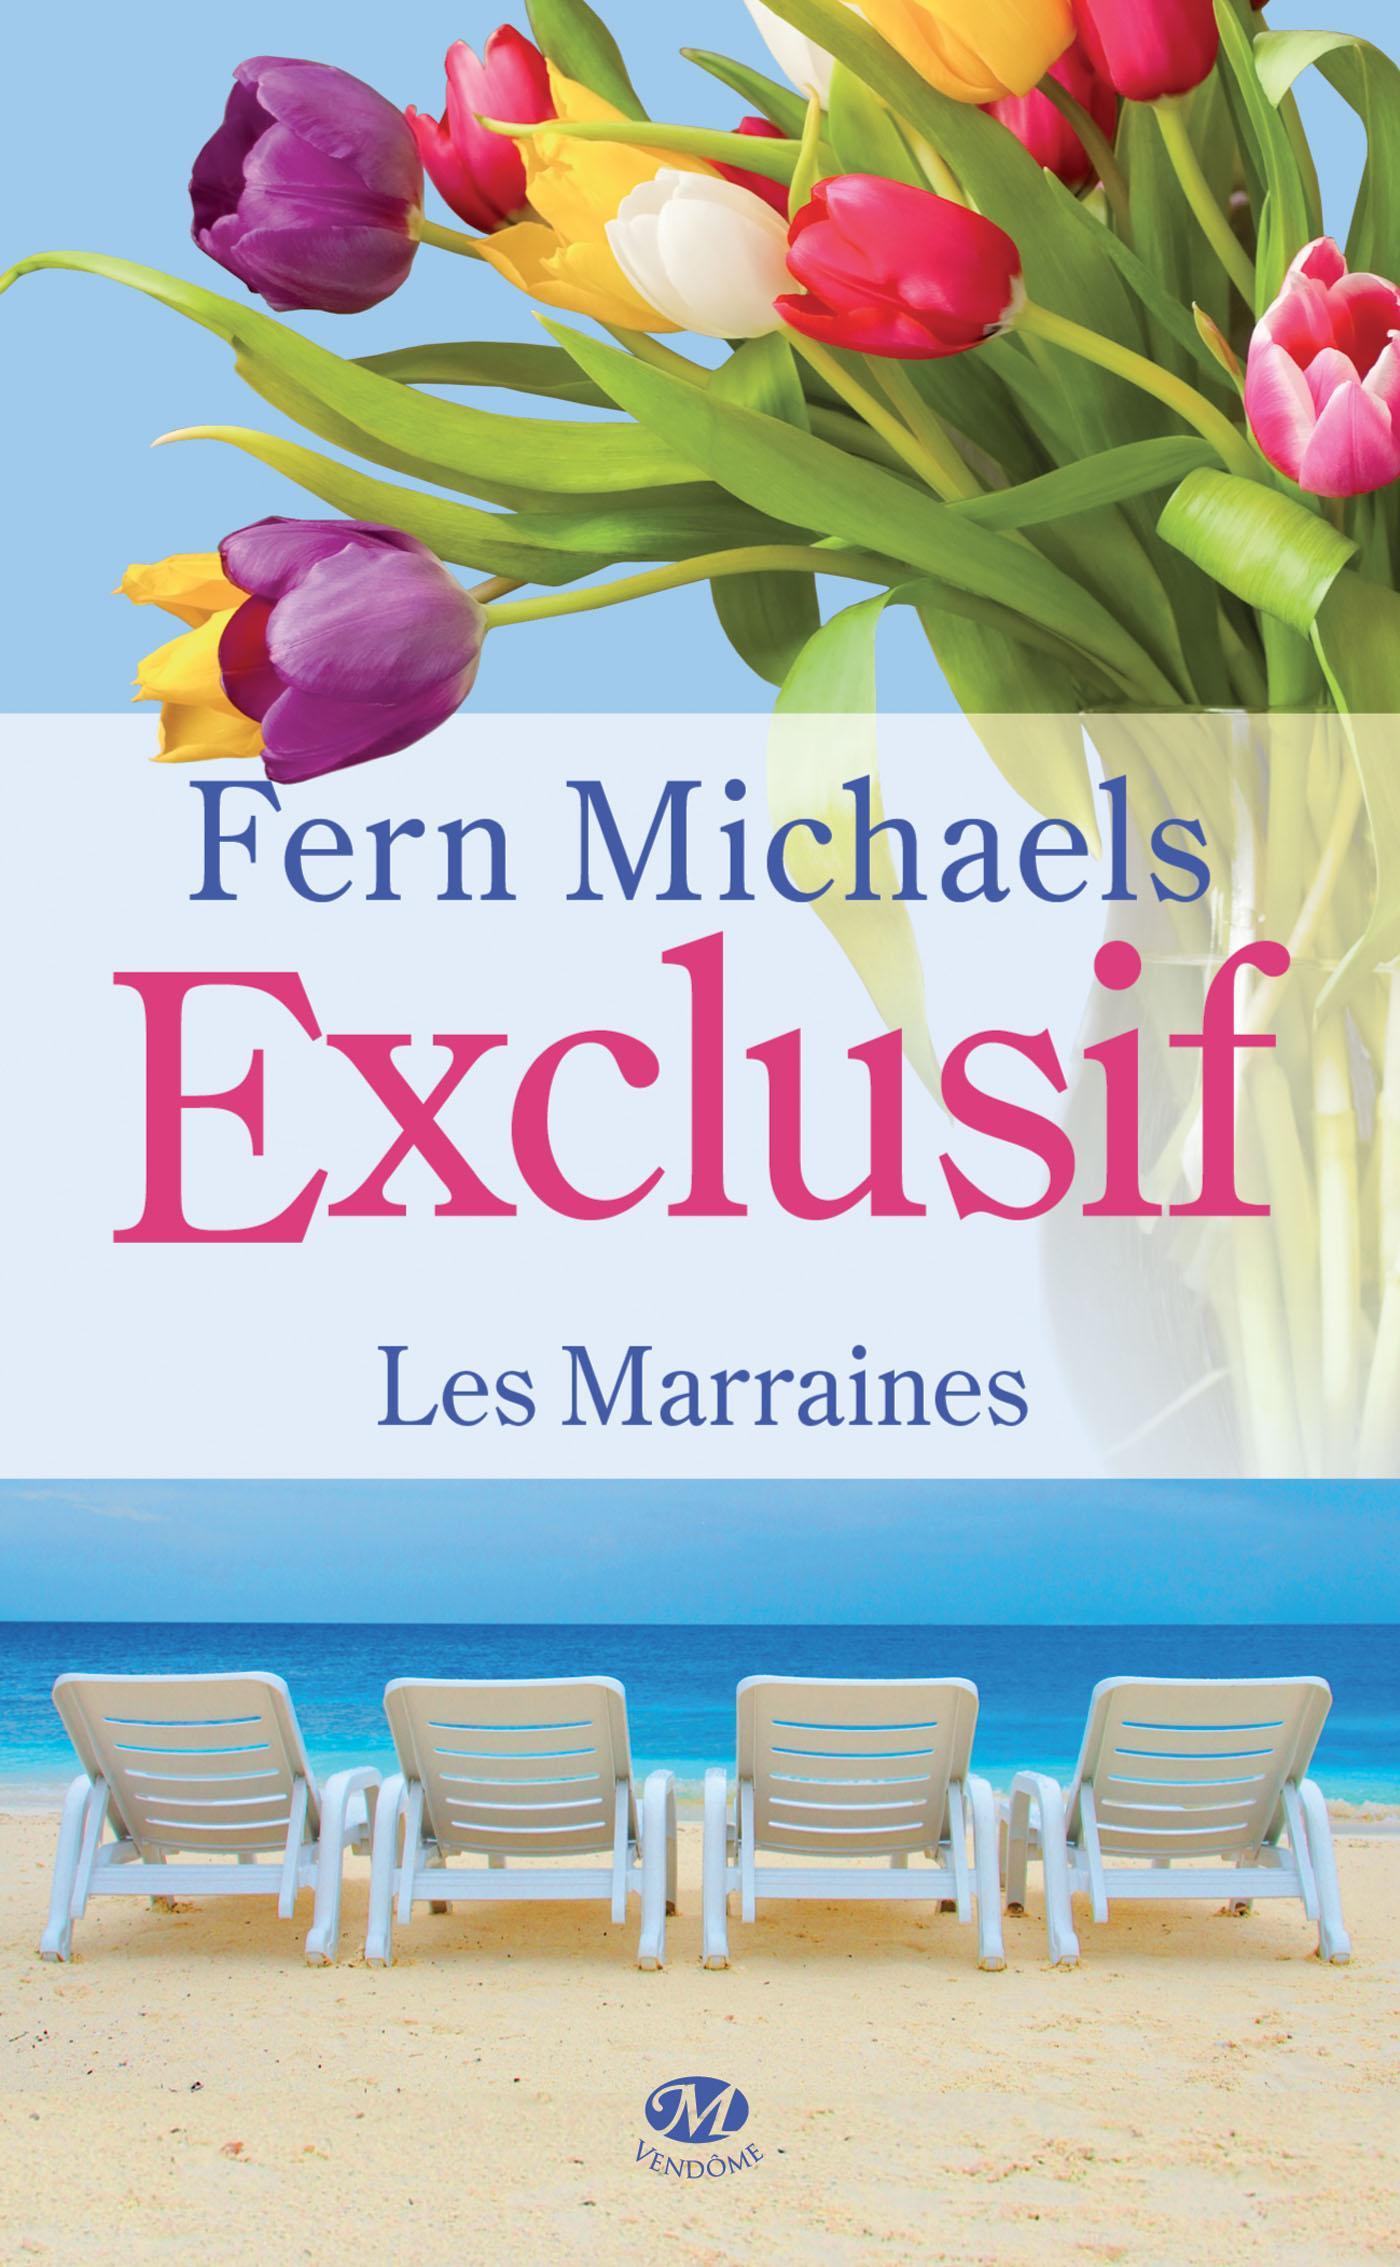 Exclusif, LES MARRAINES, T2